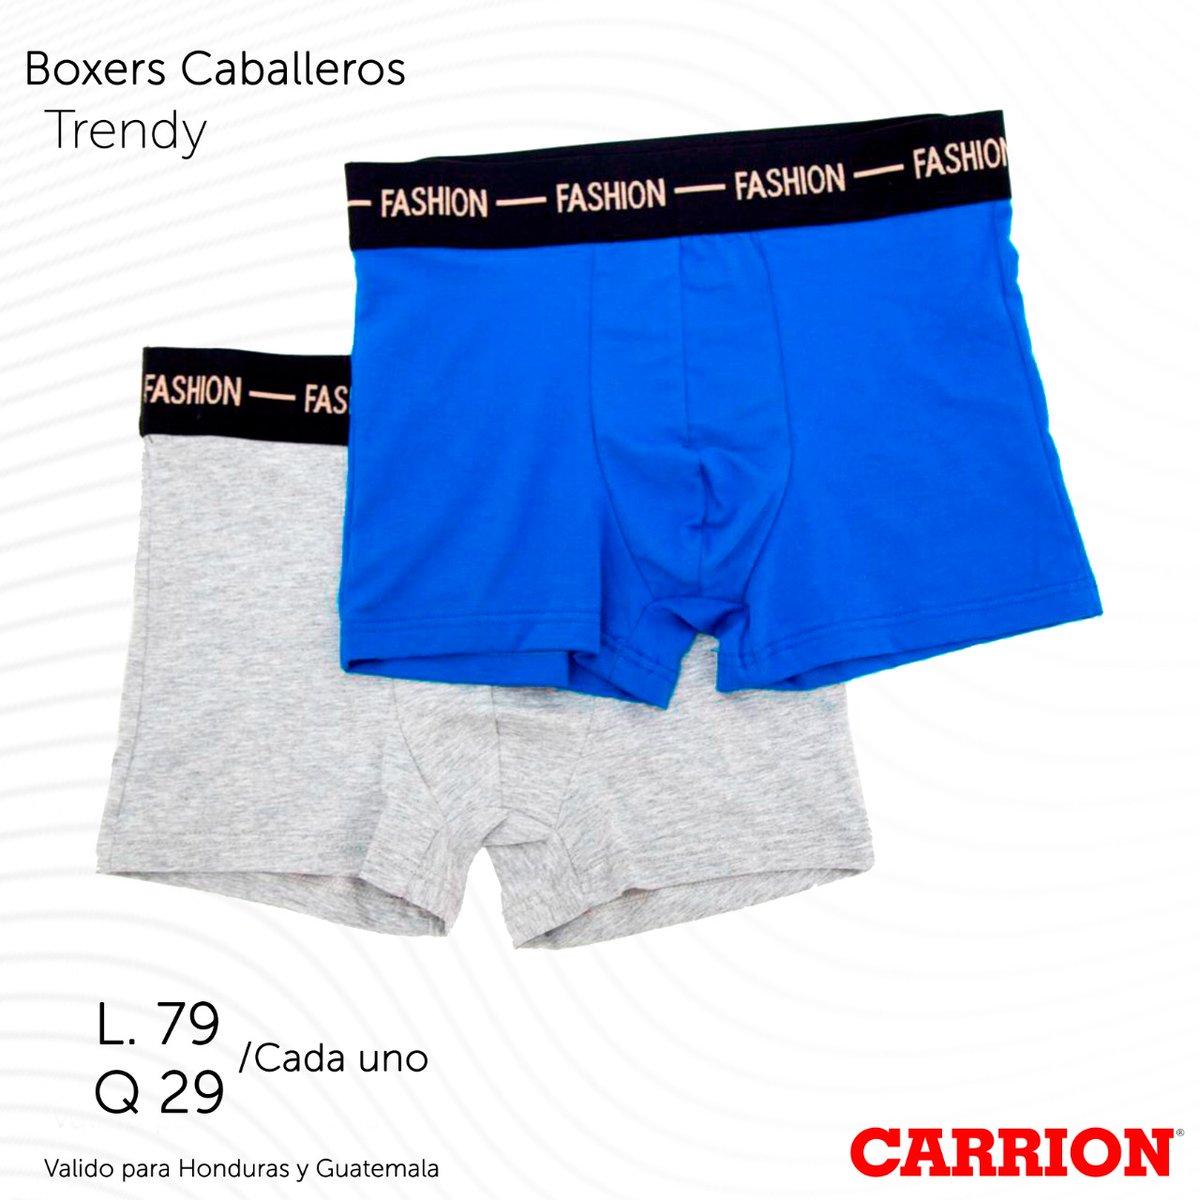 Boxers pierna corta para caballeros #tiendascarrion https://t.co/Wb5xrhDGg8